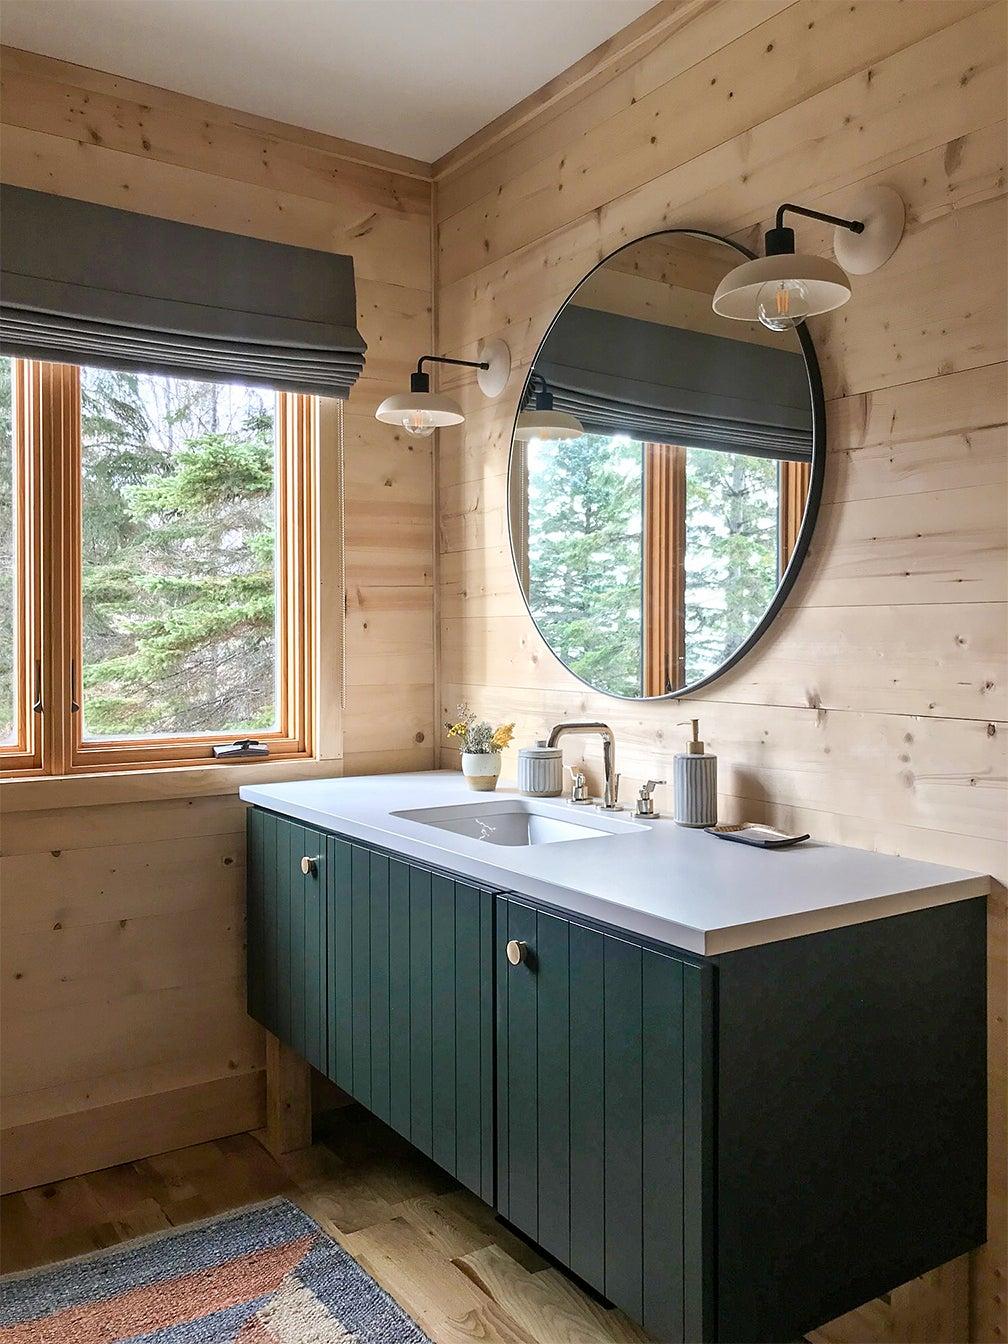 wood-paneled bathroom with green vanity